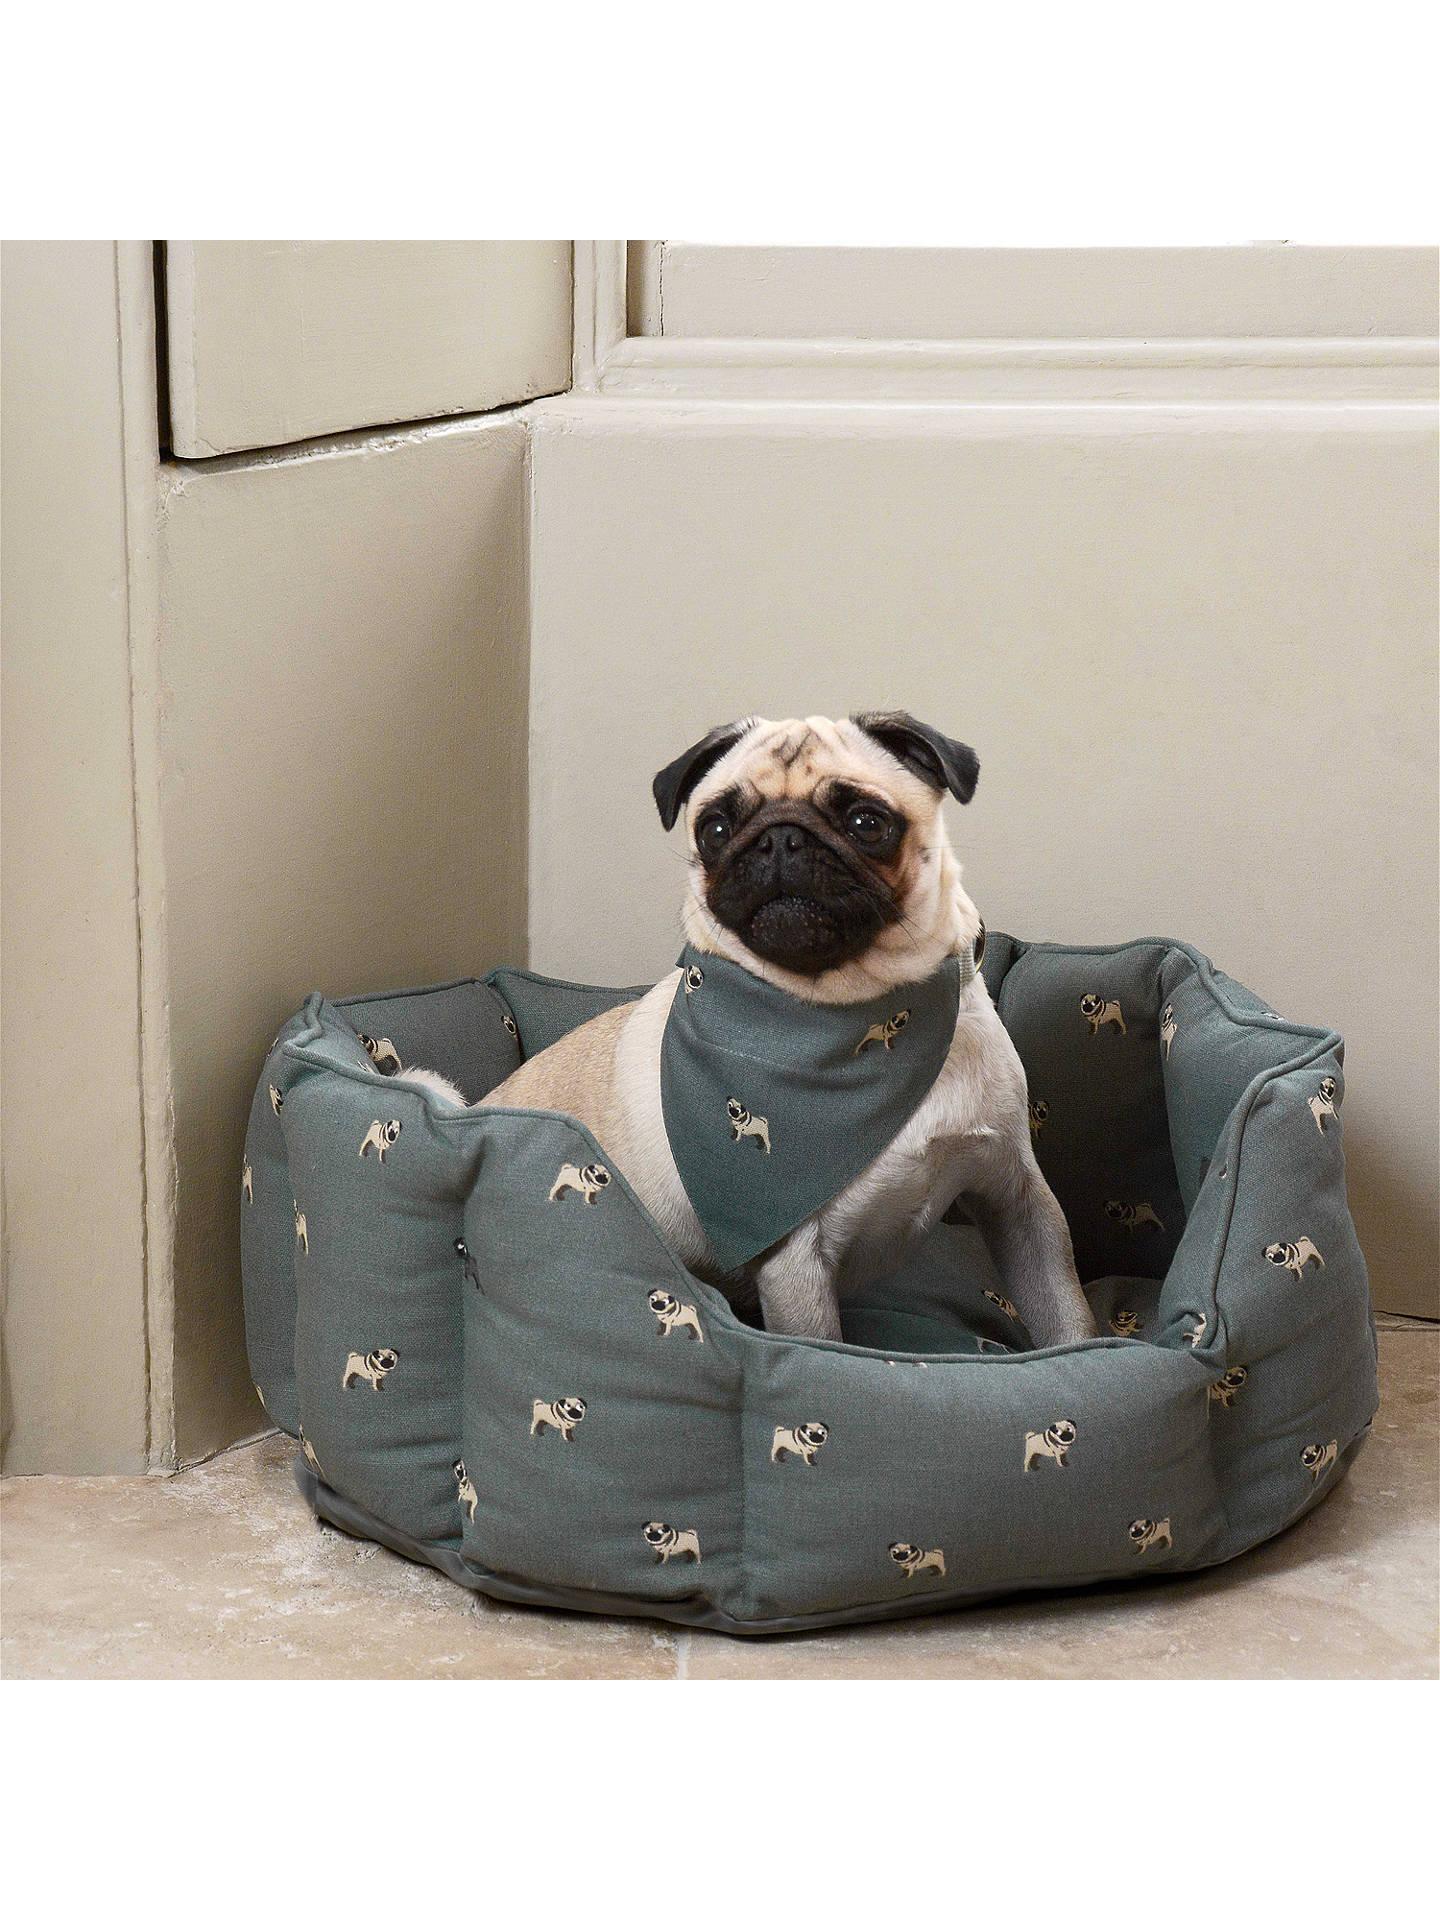 b5de2668384 ... Buy Sophie Allport Pug Dog Bed